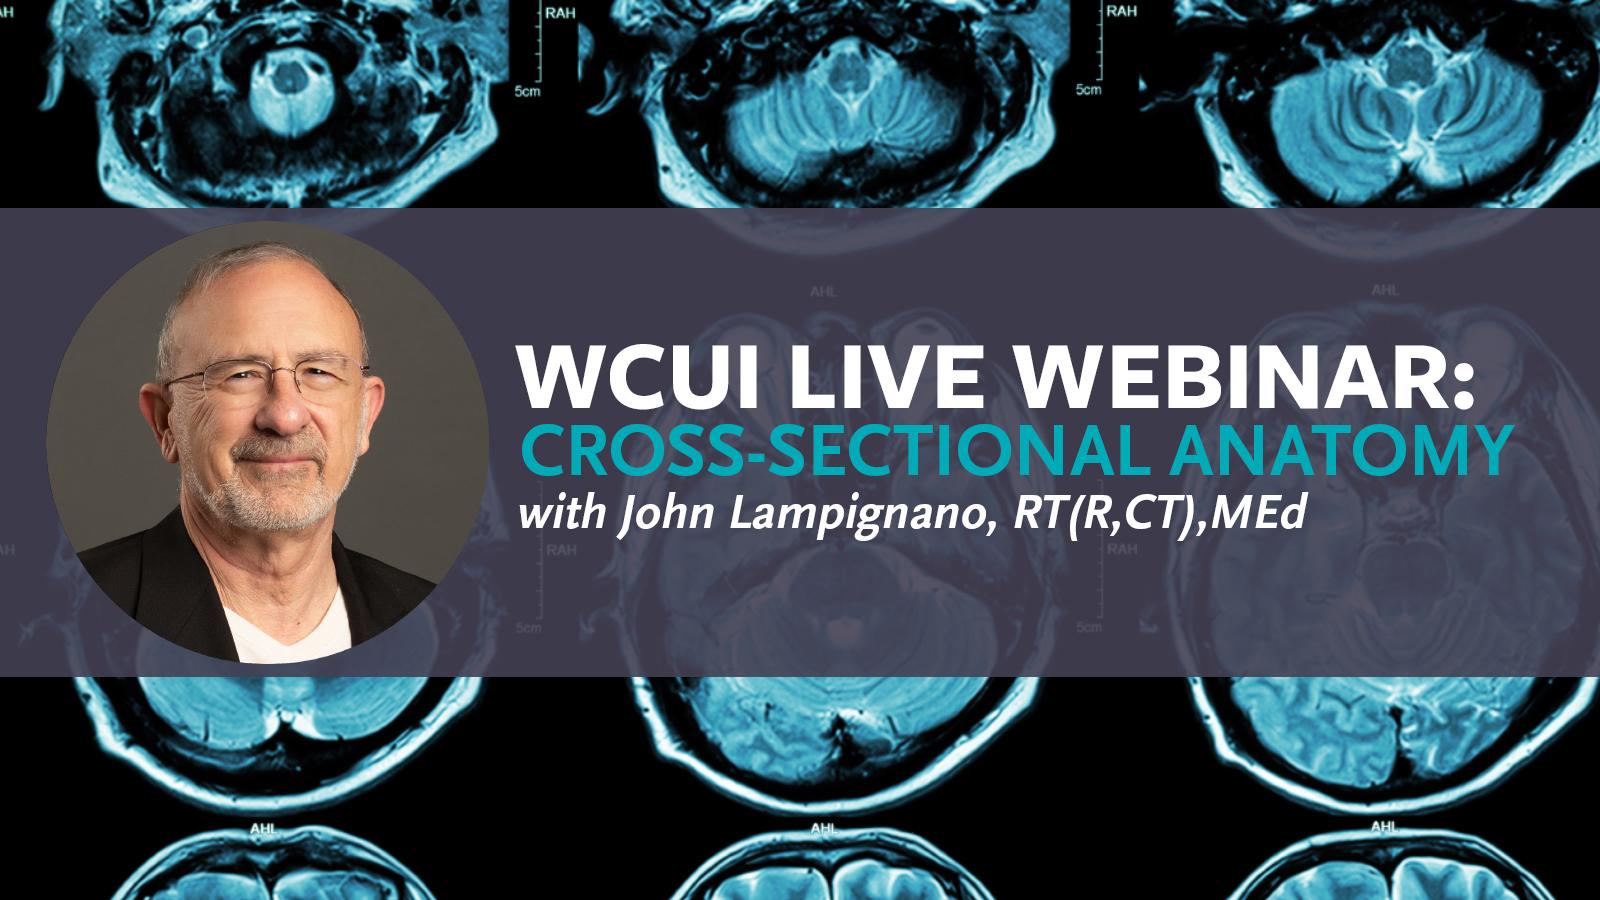 WCUI Live Webinar with John P. Lampignano